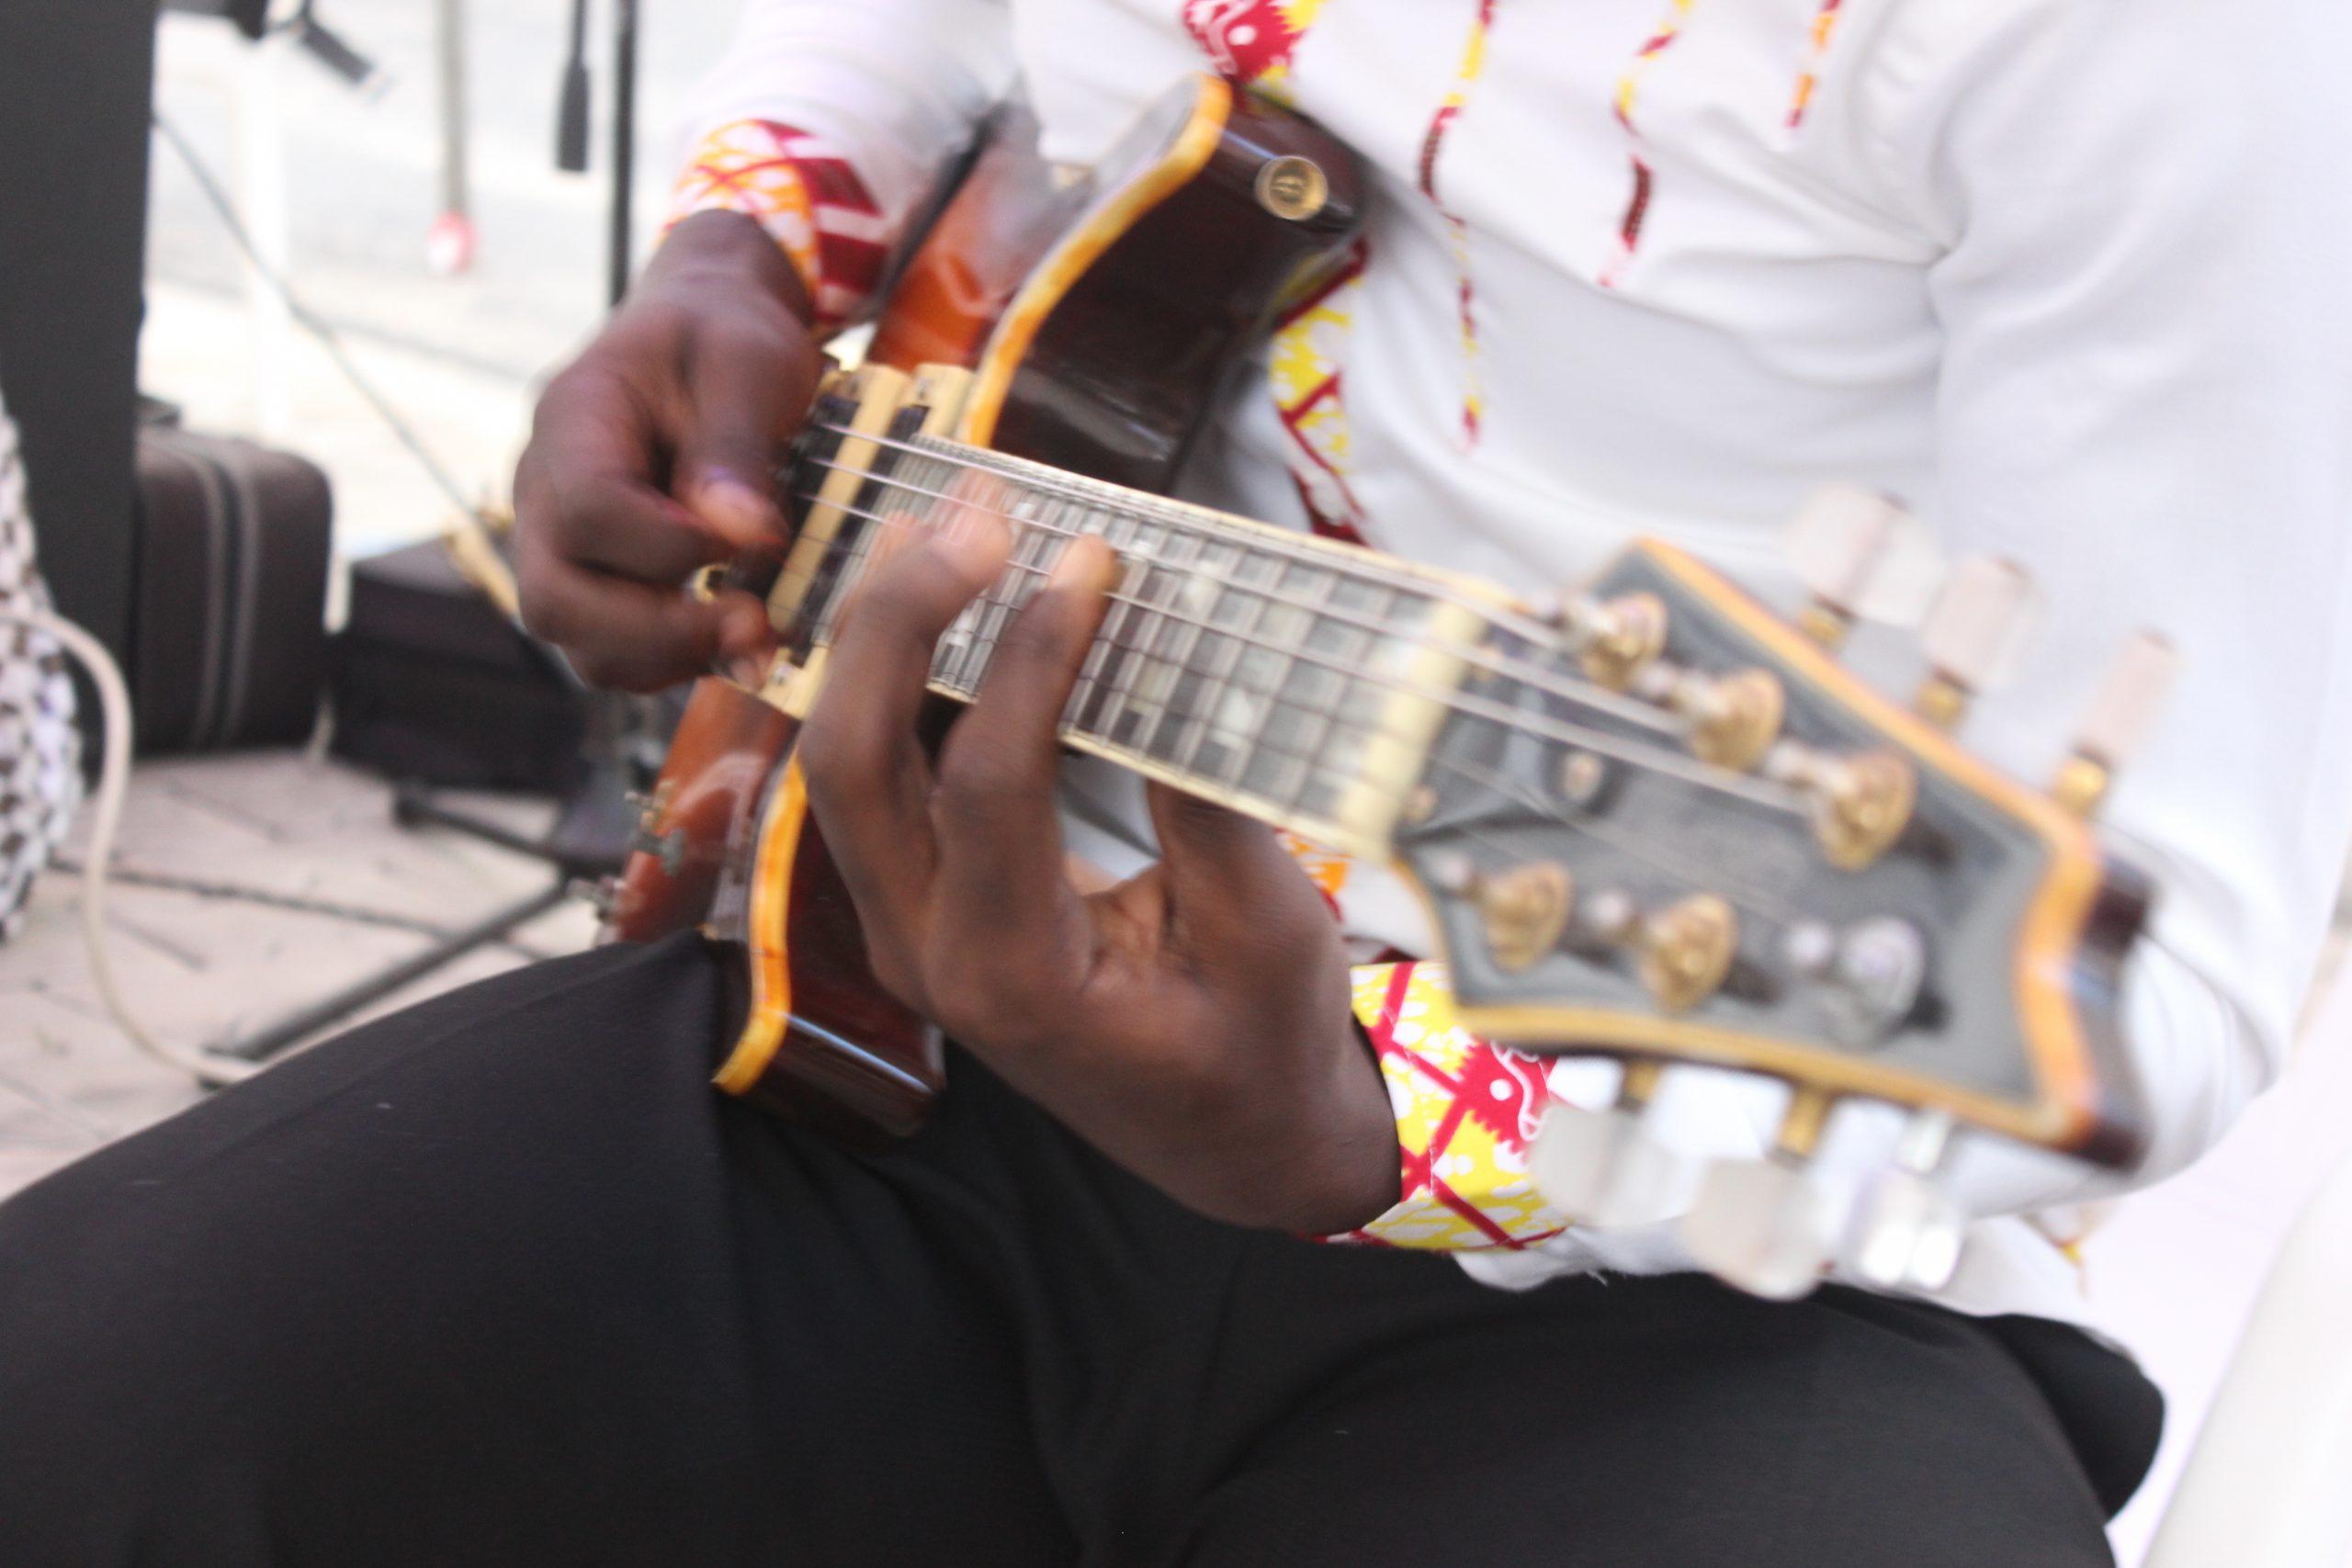 File:jeu De Guitare 2 - Wikimedia Commons serapportantà Jeu D Instruments